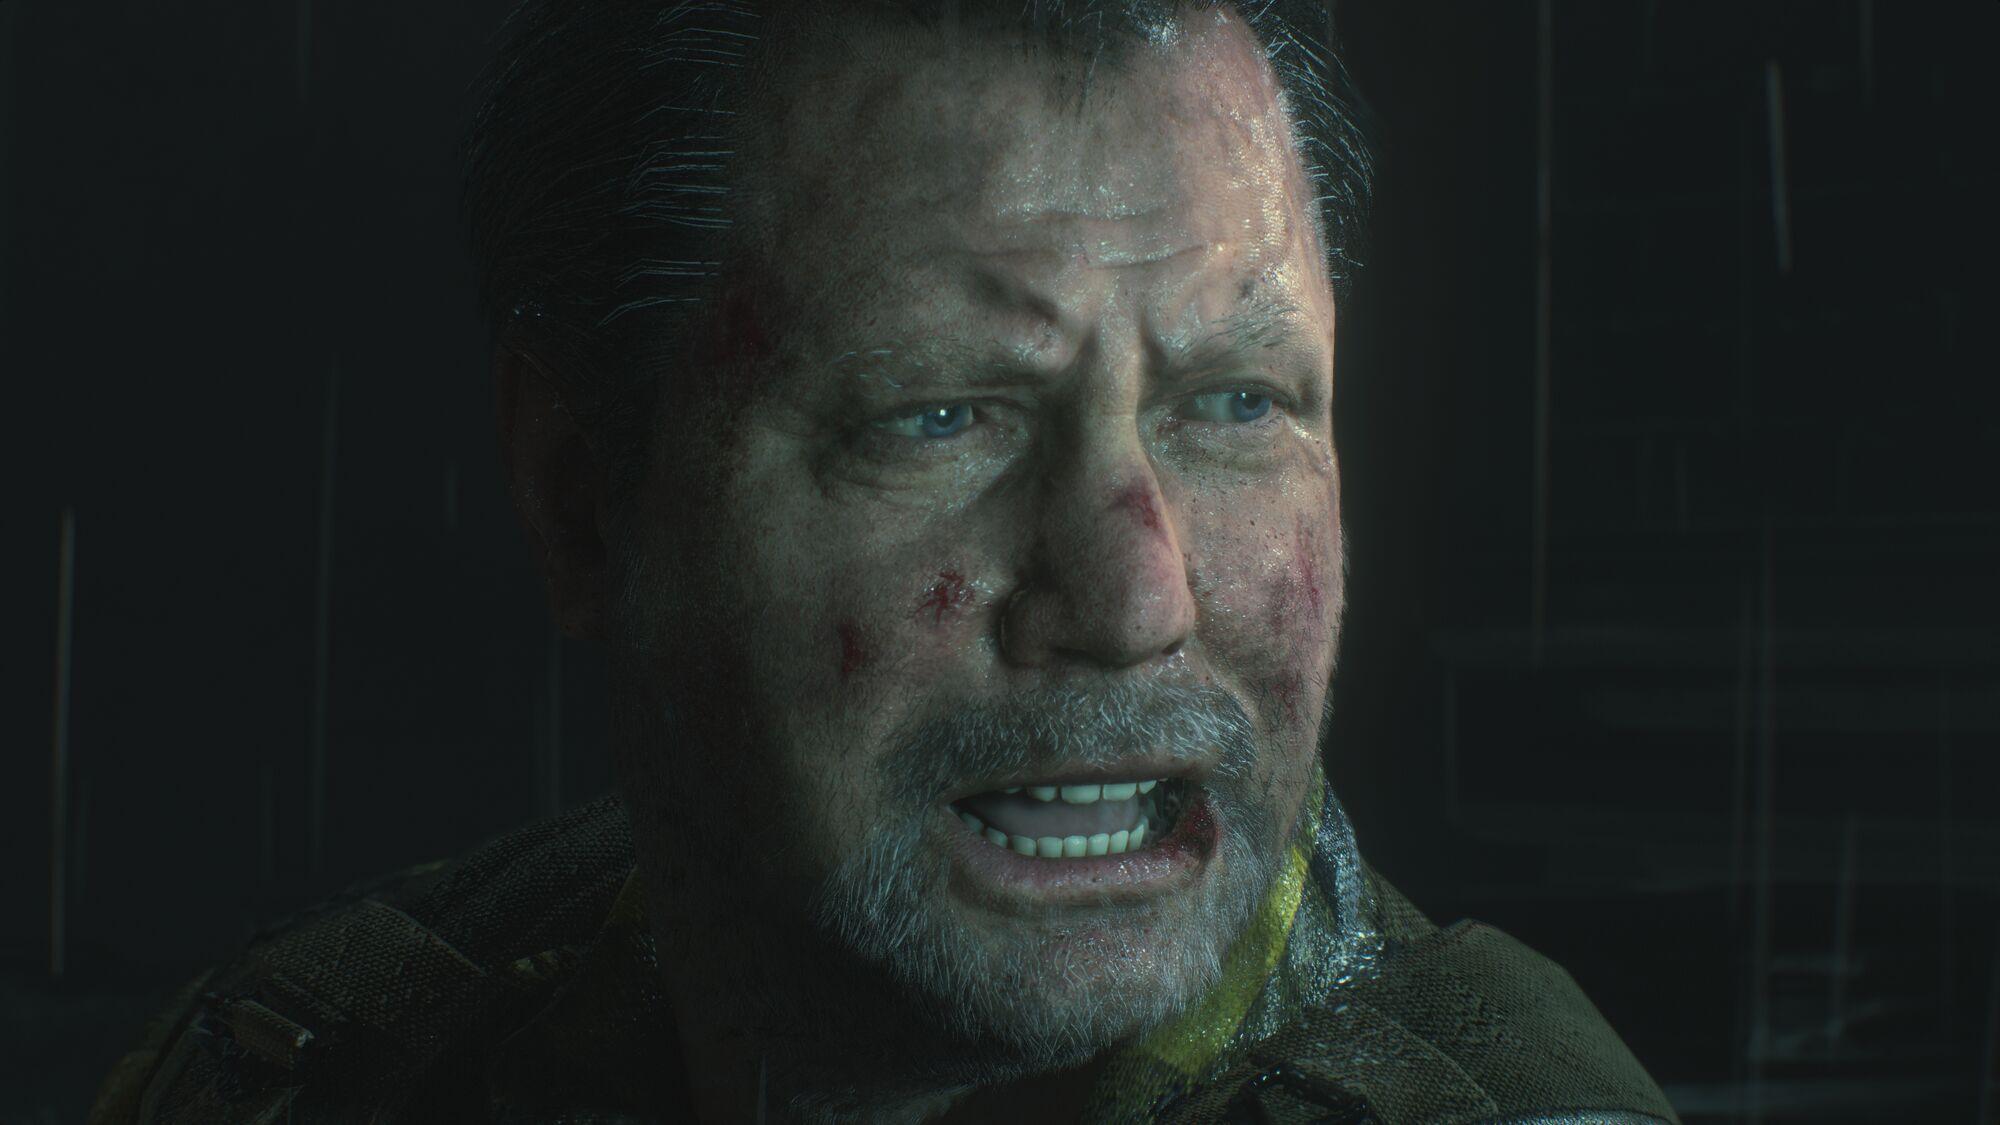 Robert Kendo Resident Evil Wiki Fandom Powered By Wikia